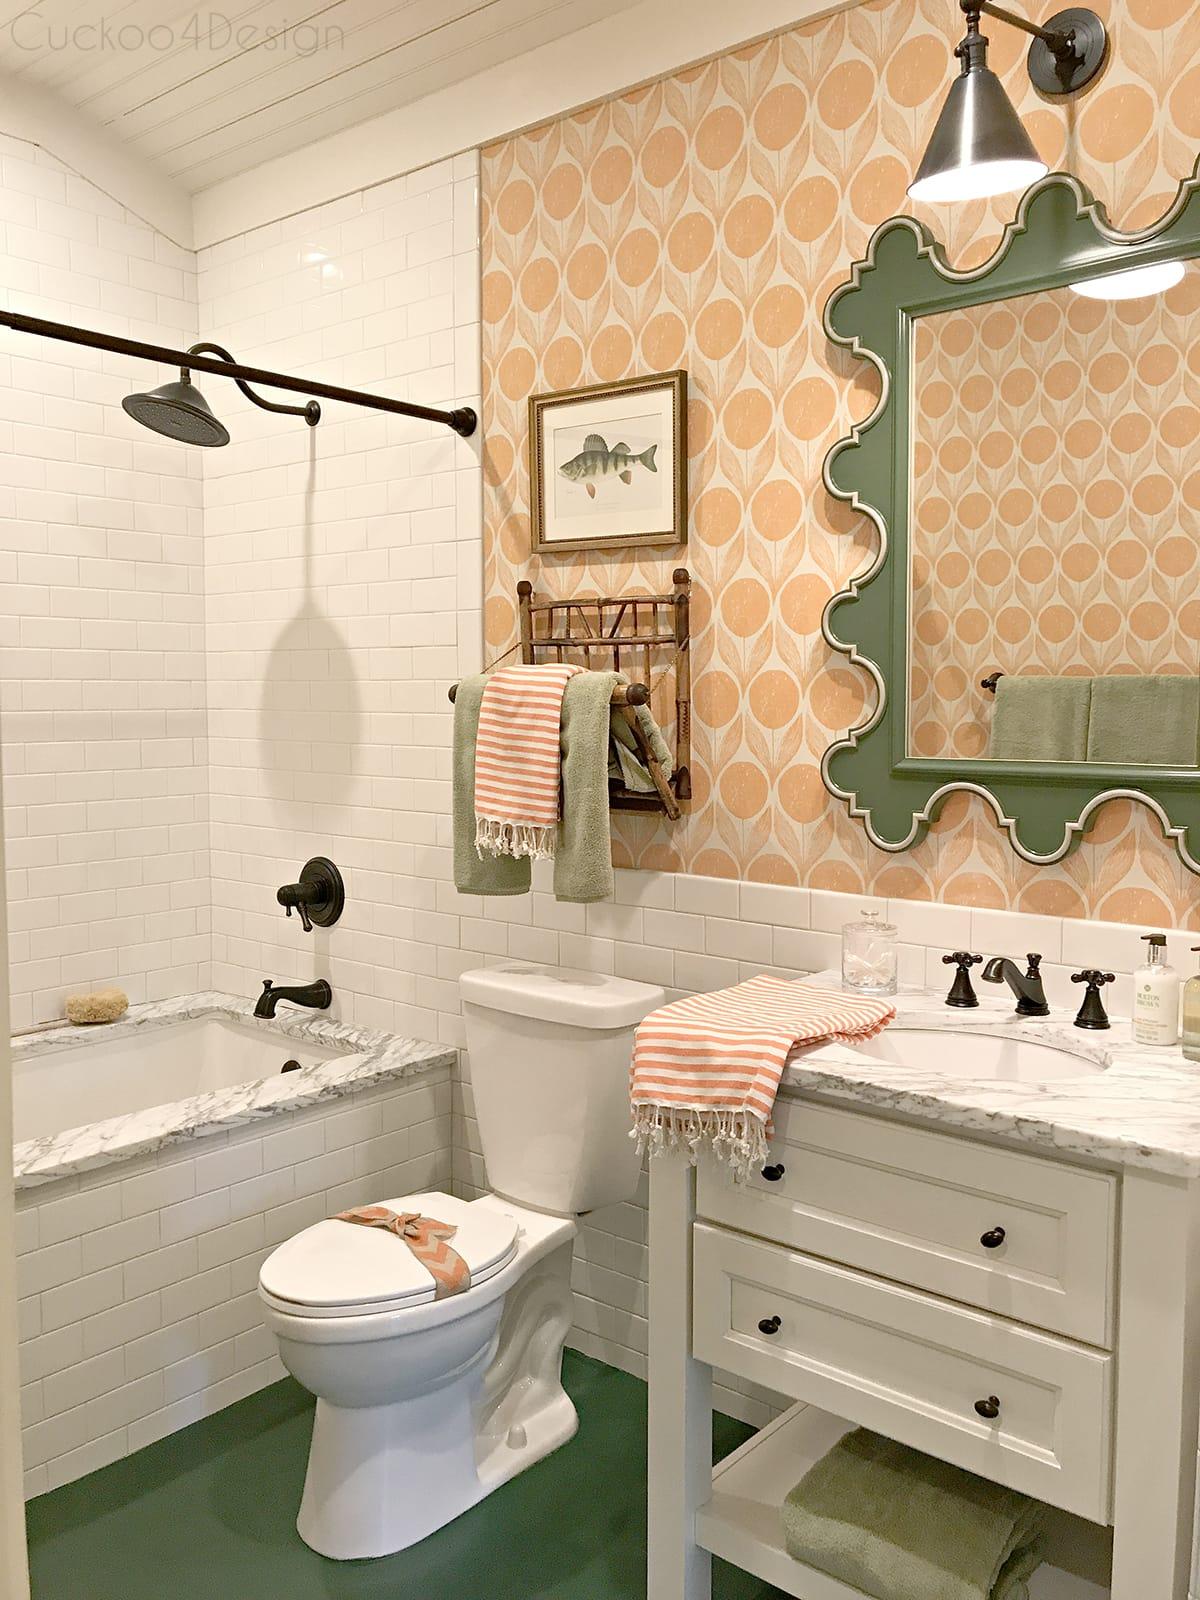 green scalloped mirror with orange wallpaper, hunter green painted wood floor and @deltafaucet fixtures in bathroom